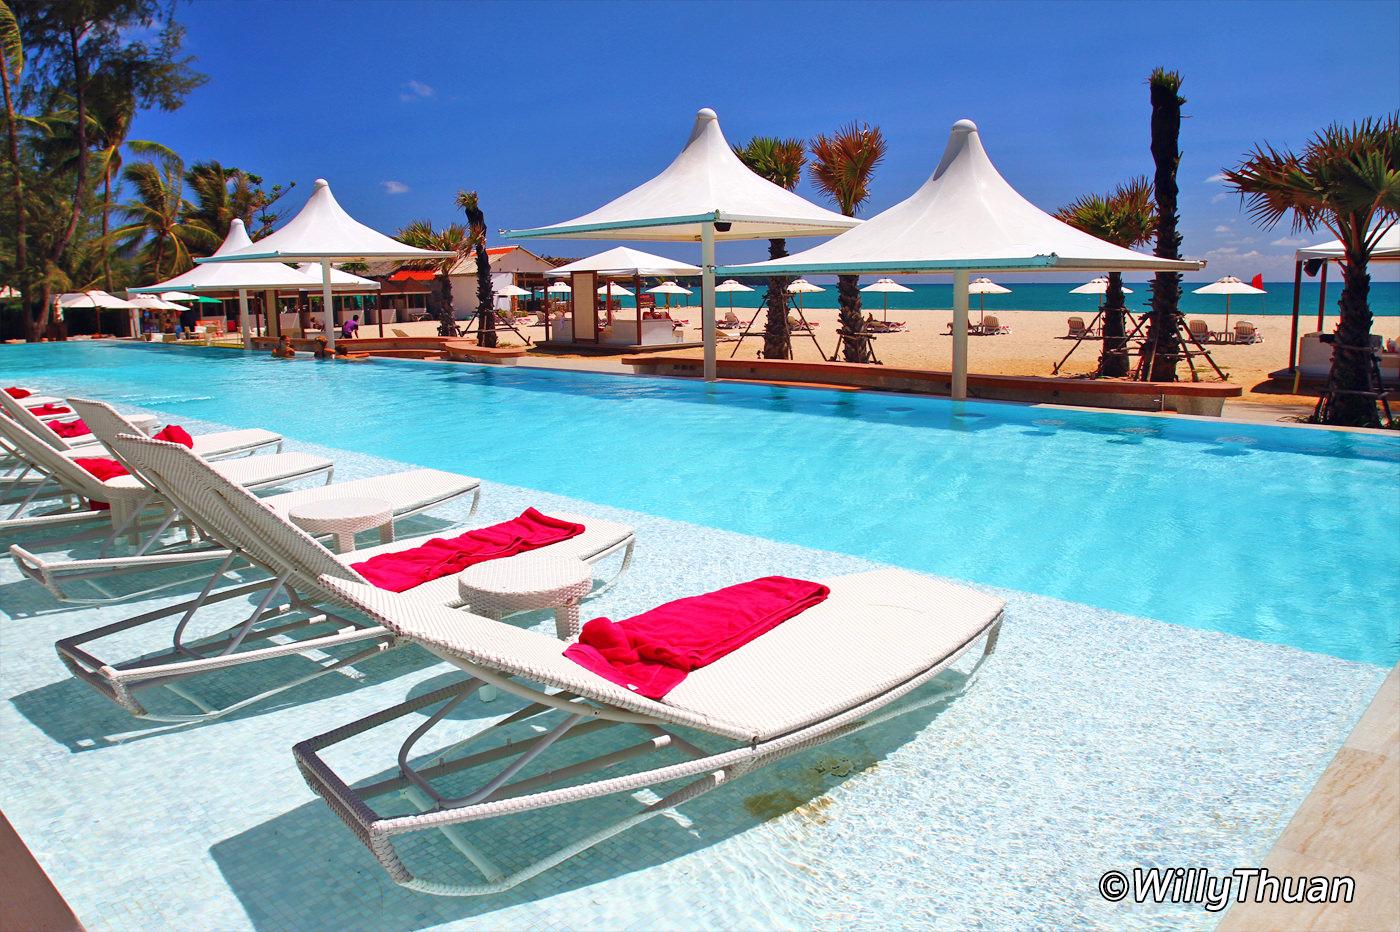 Xana Beach Club at Angsana Resort Phuket